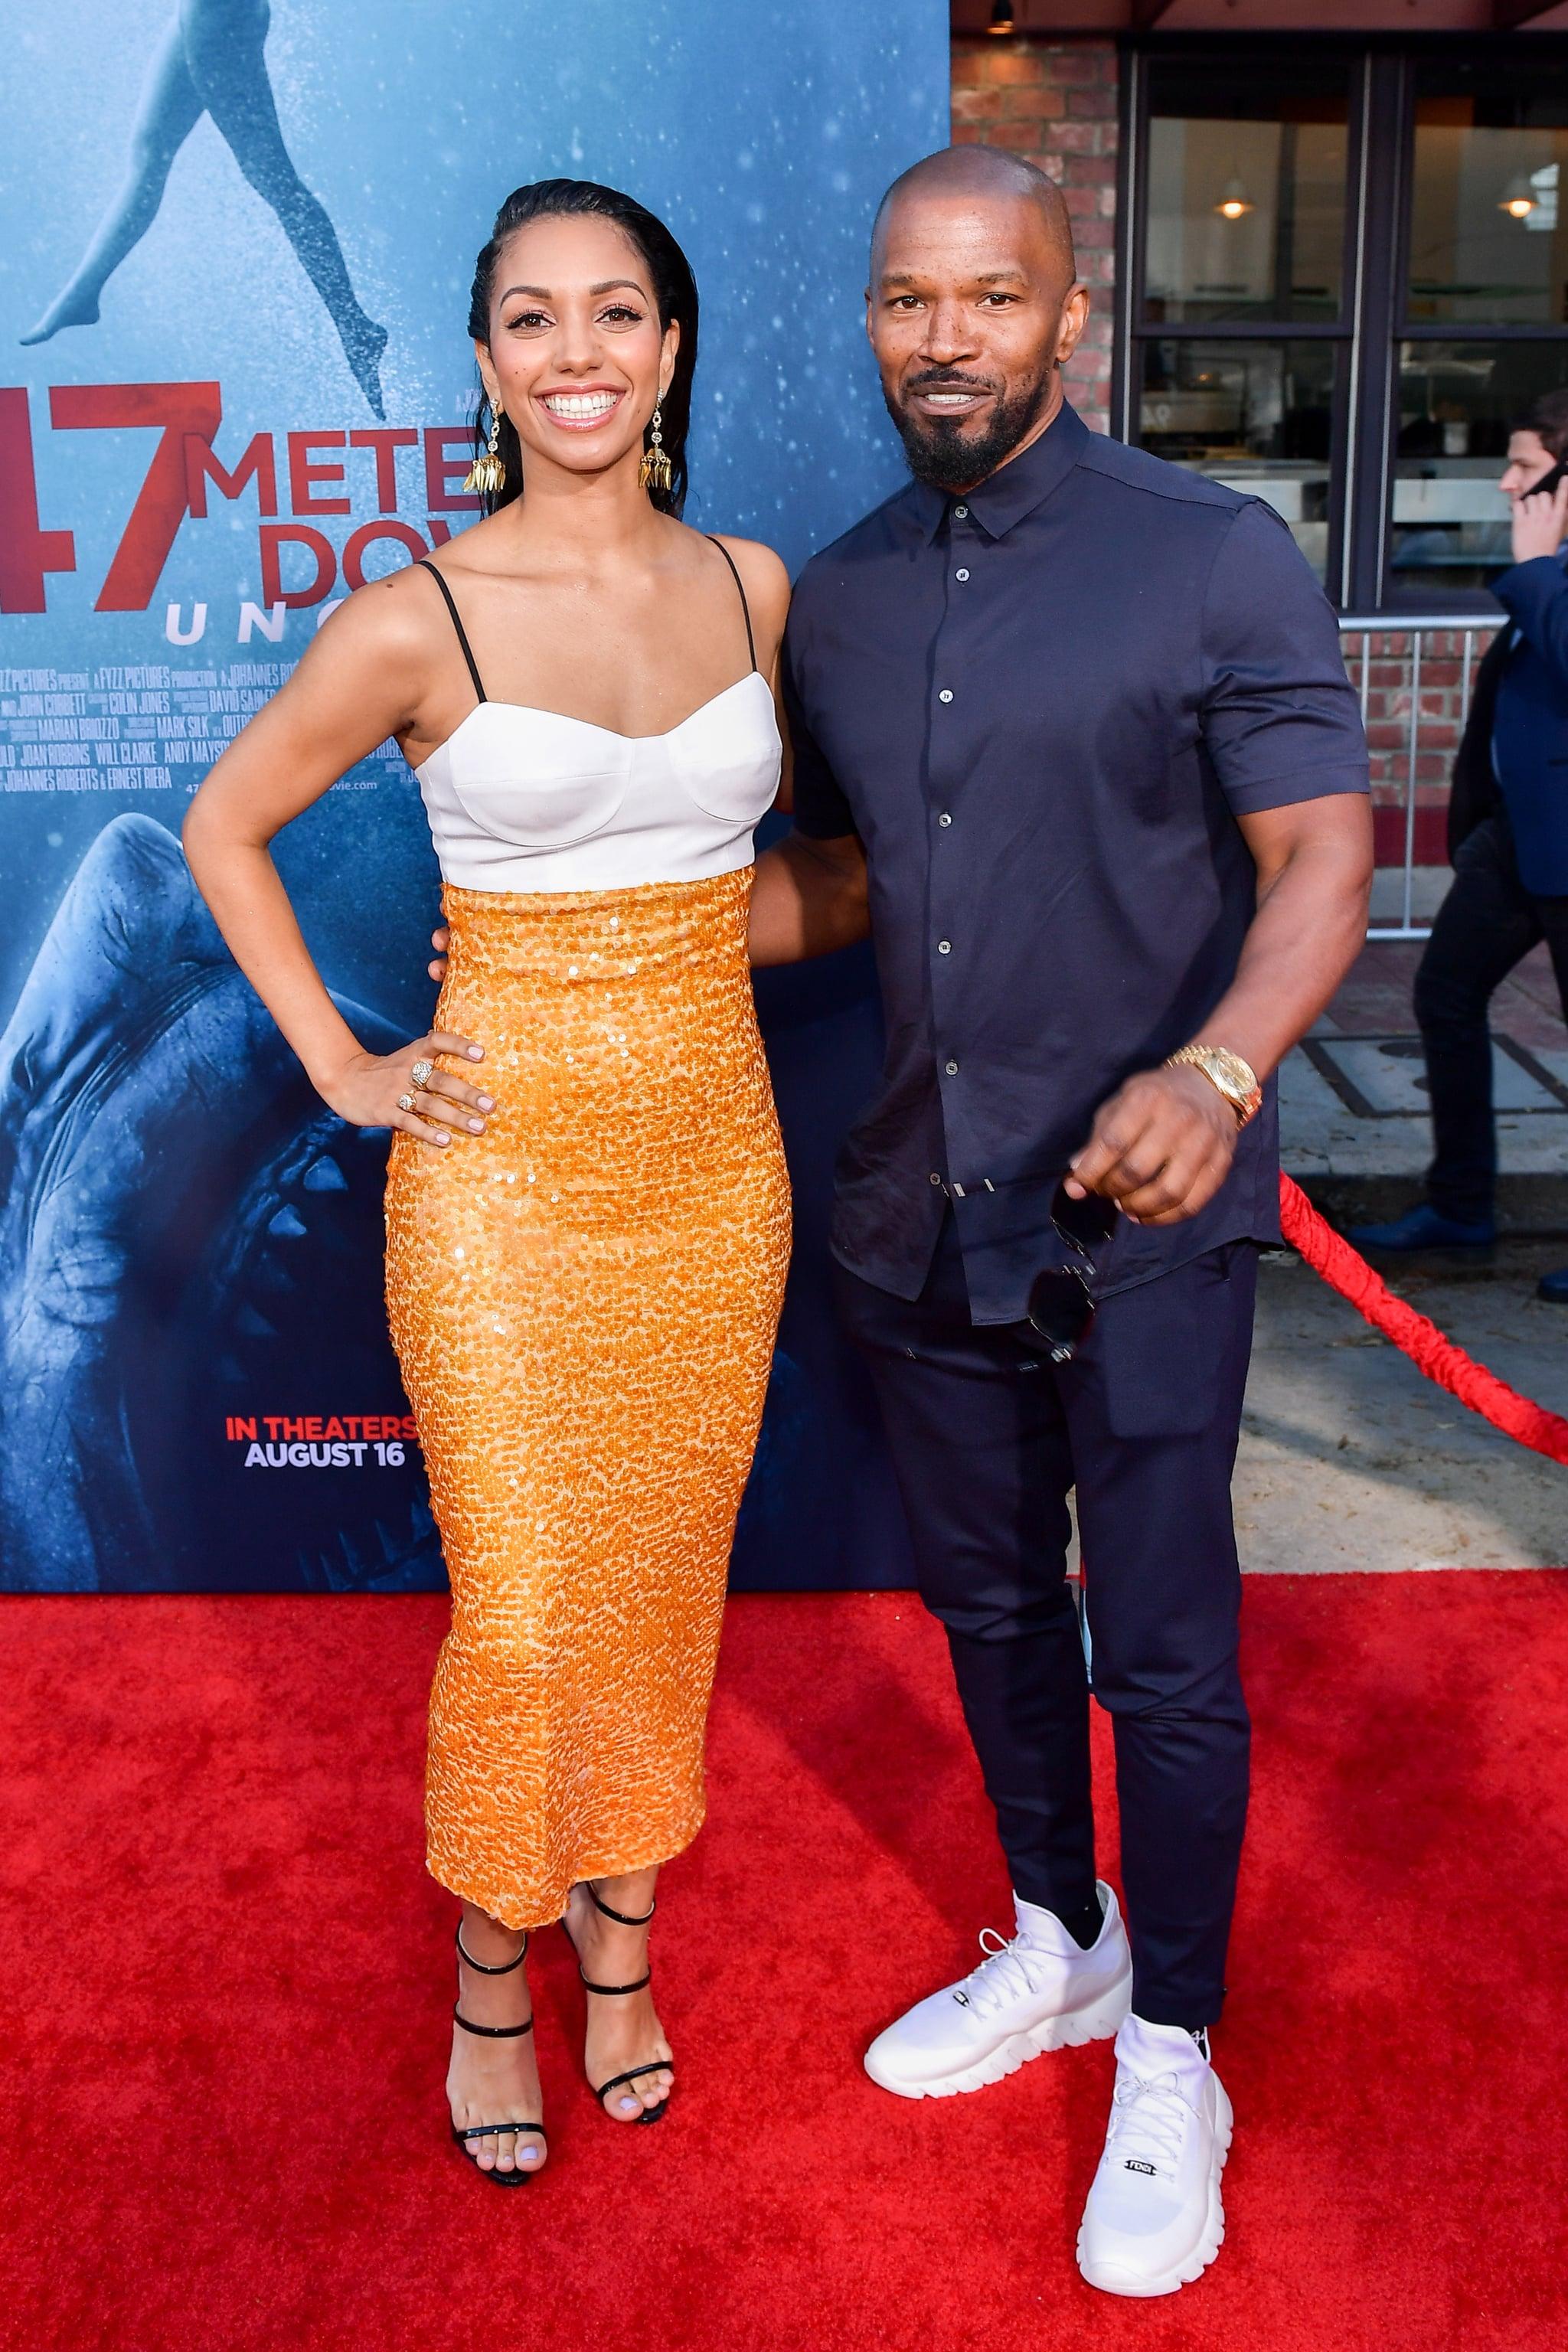 WESTWOOD, CALIFORNIA - AUGUST 13: Corinne Foxx and Jamie Foxx attend the LA Premiere of Entertainment Studios'